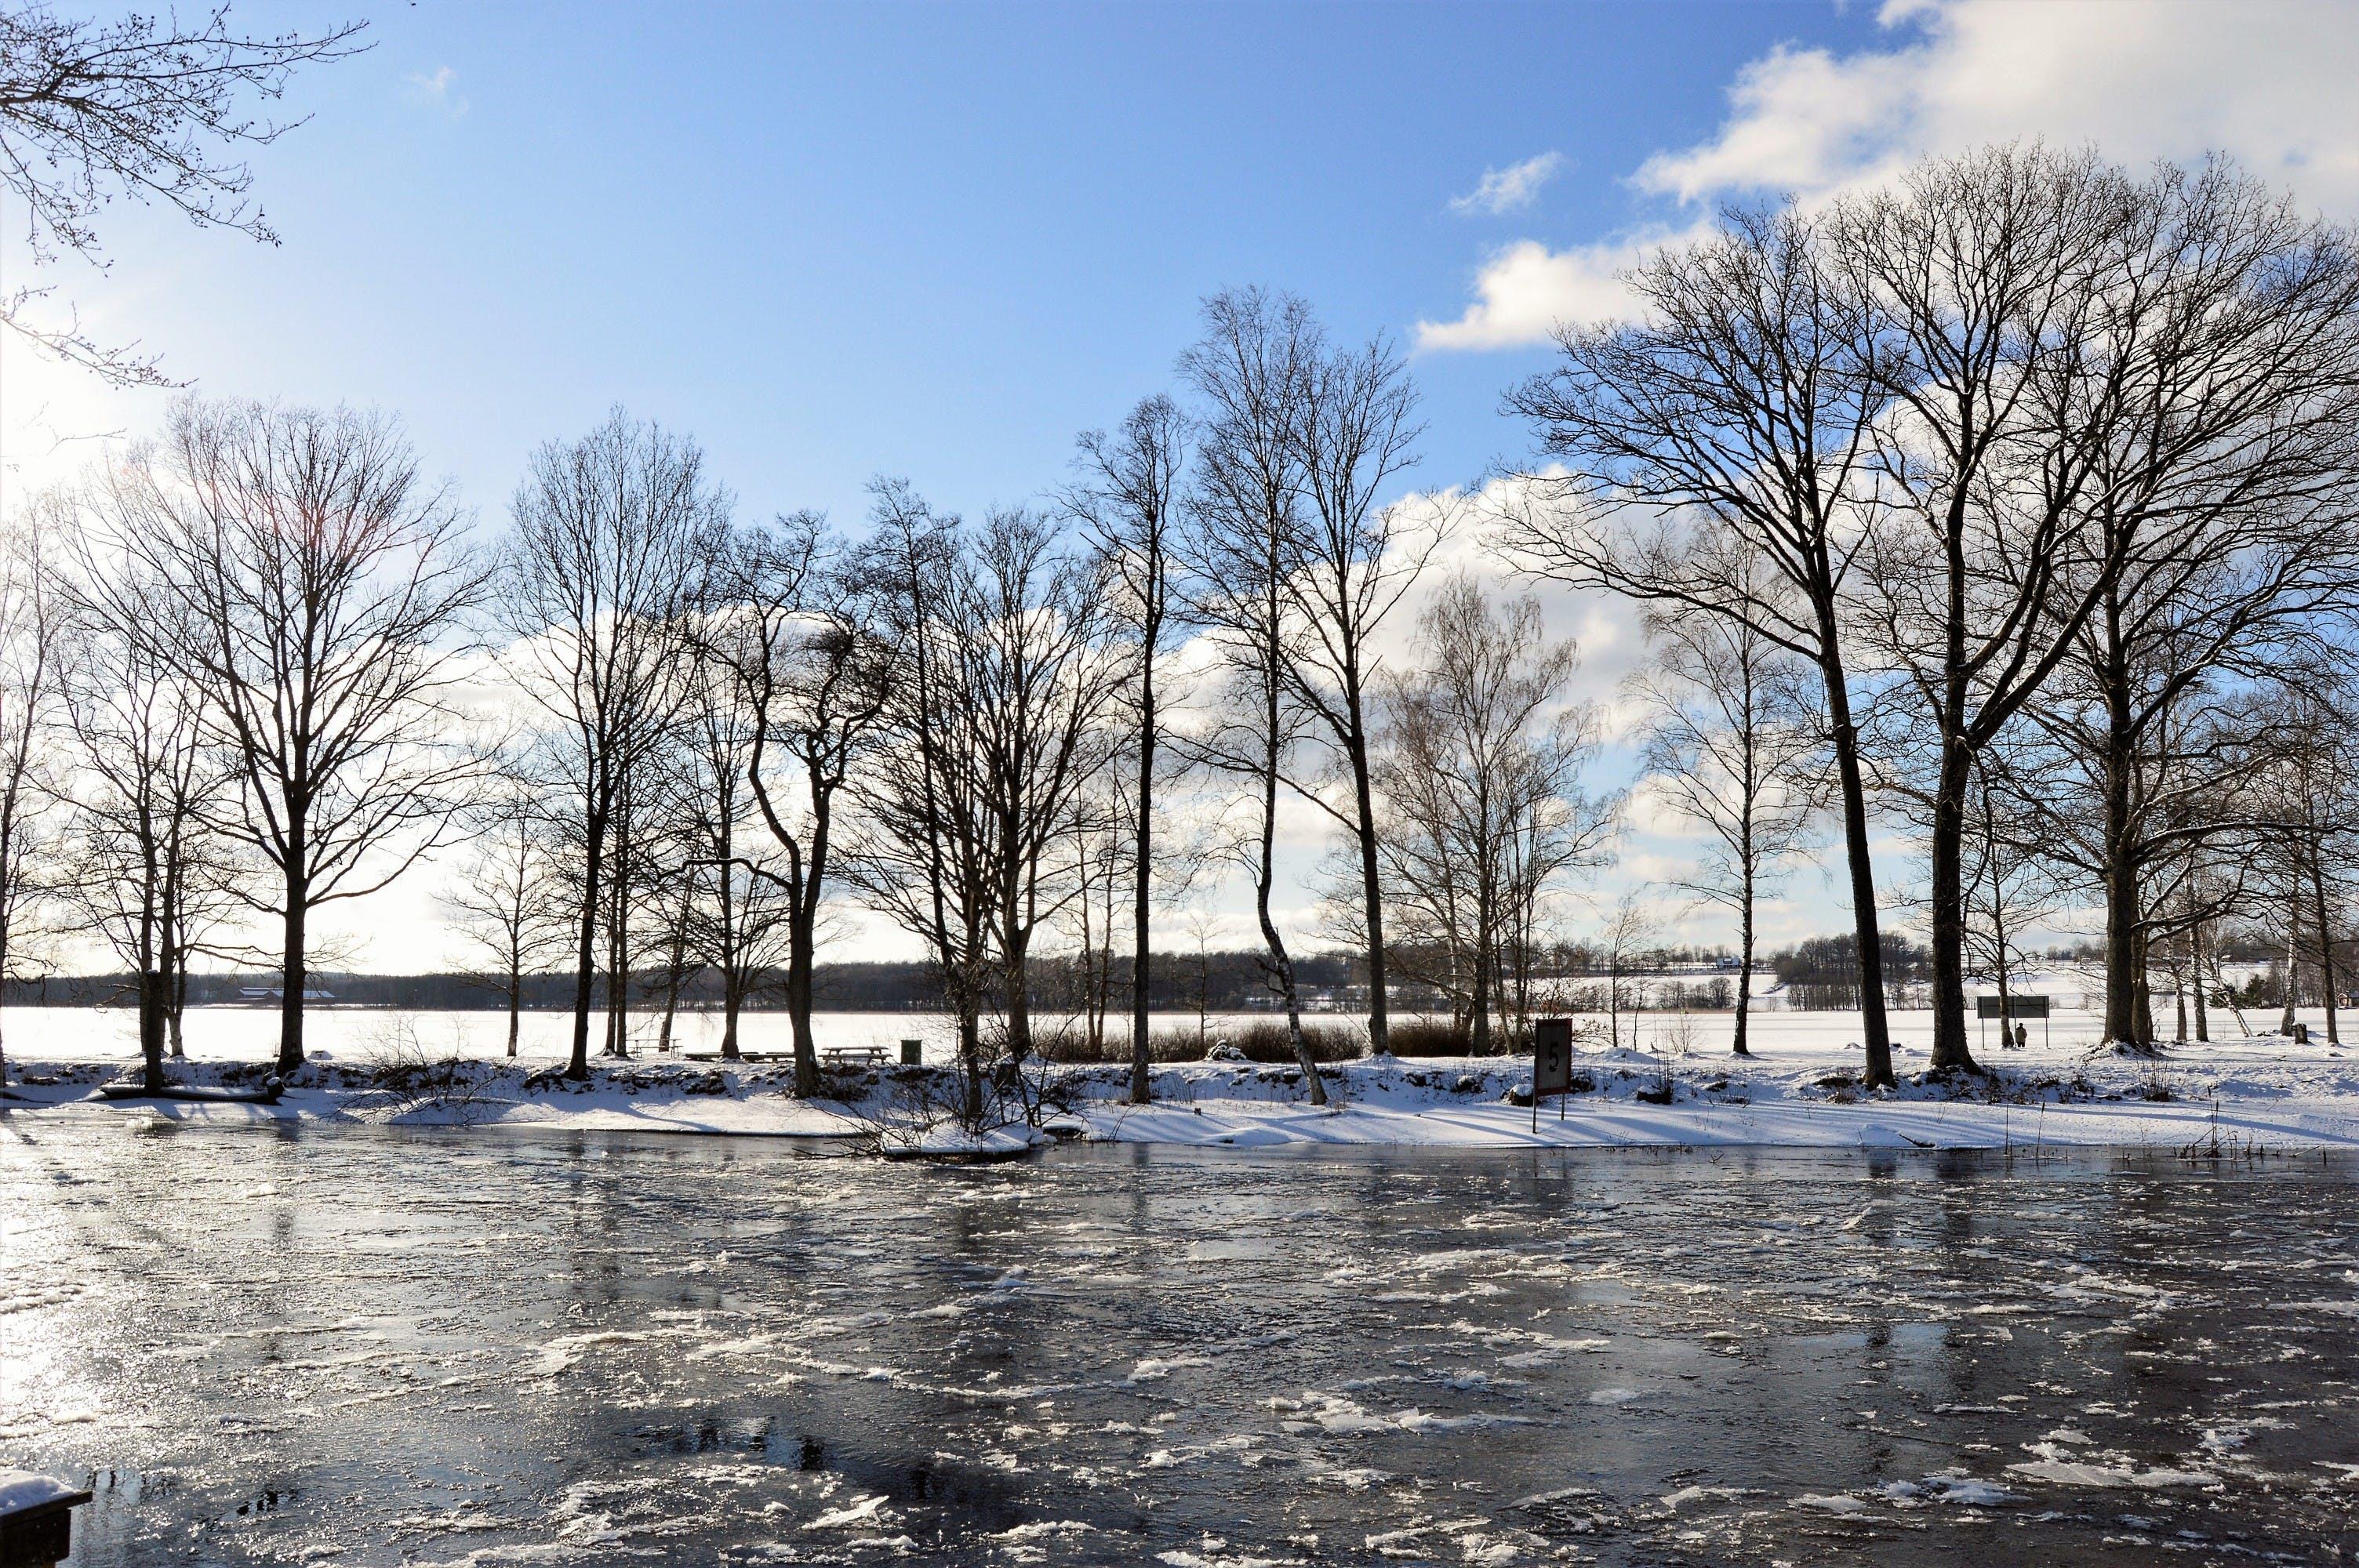 Brown Tree Lot on White Snow